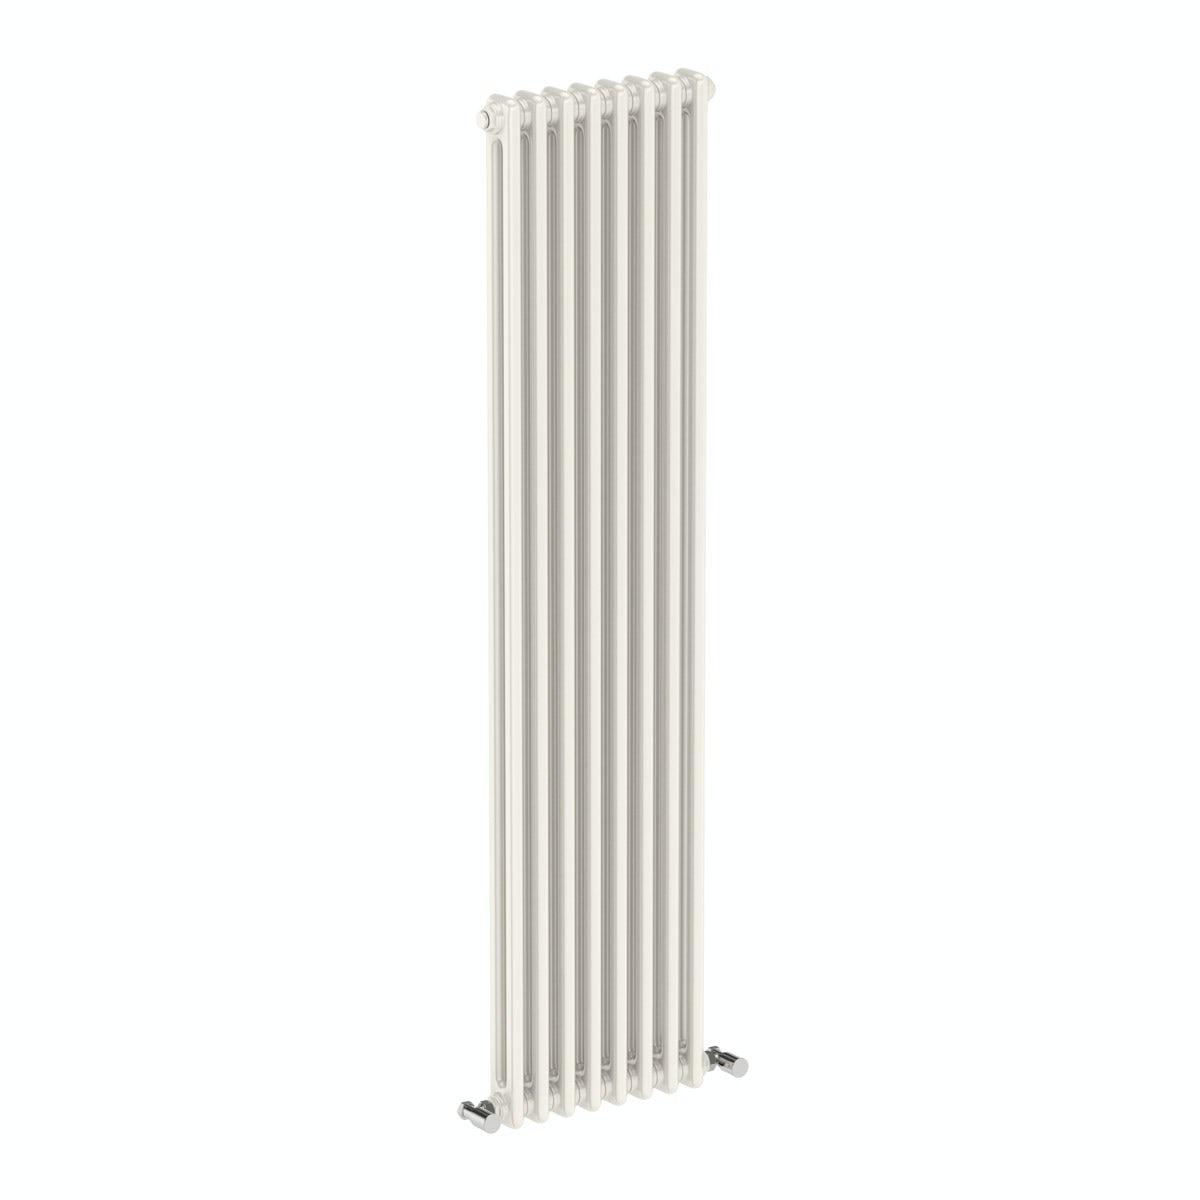 Dulwich vertical white double column radiator 1500 x 378